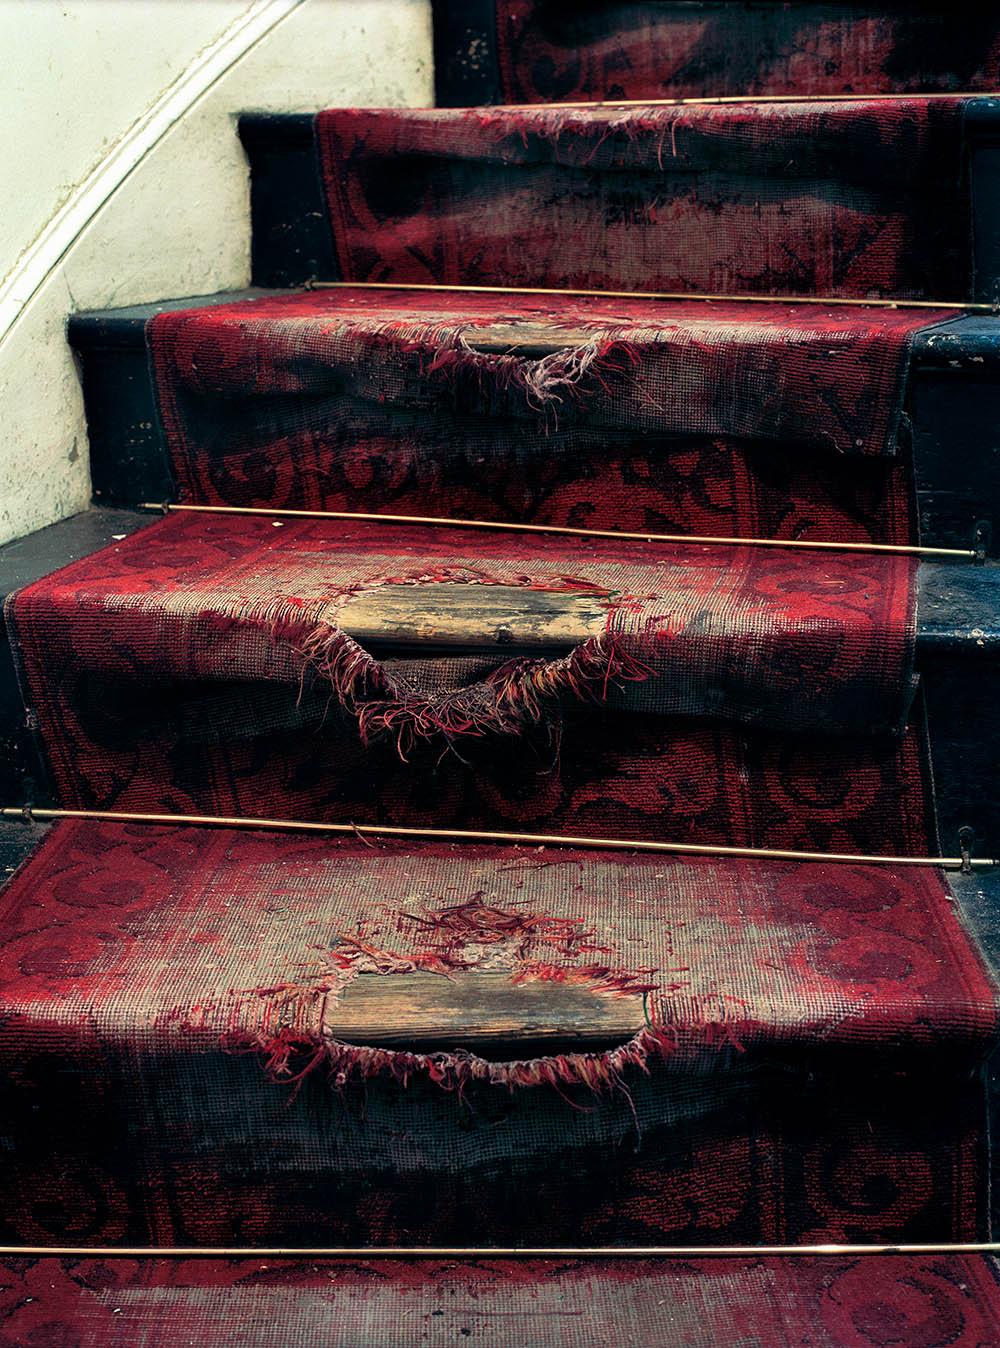 worn out carpet